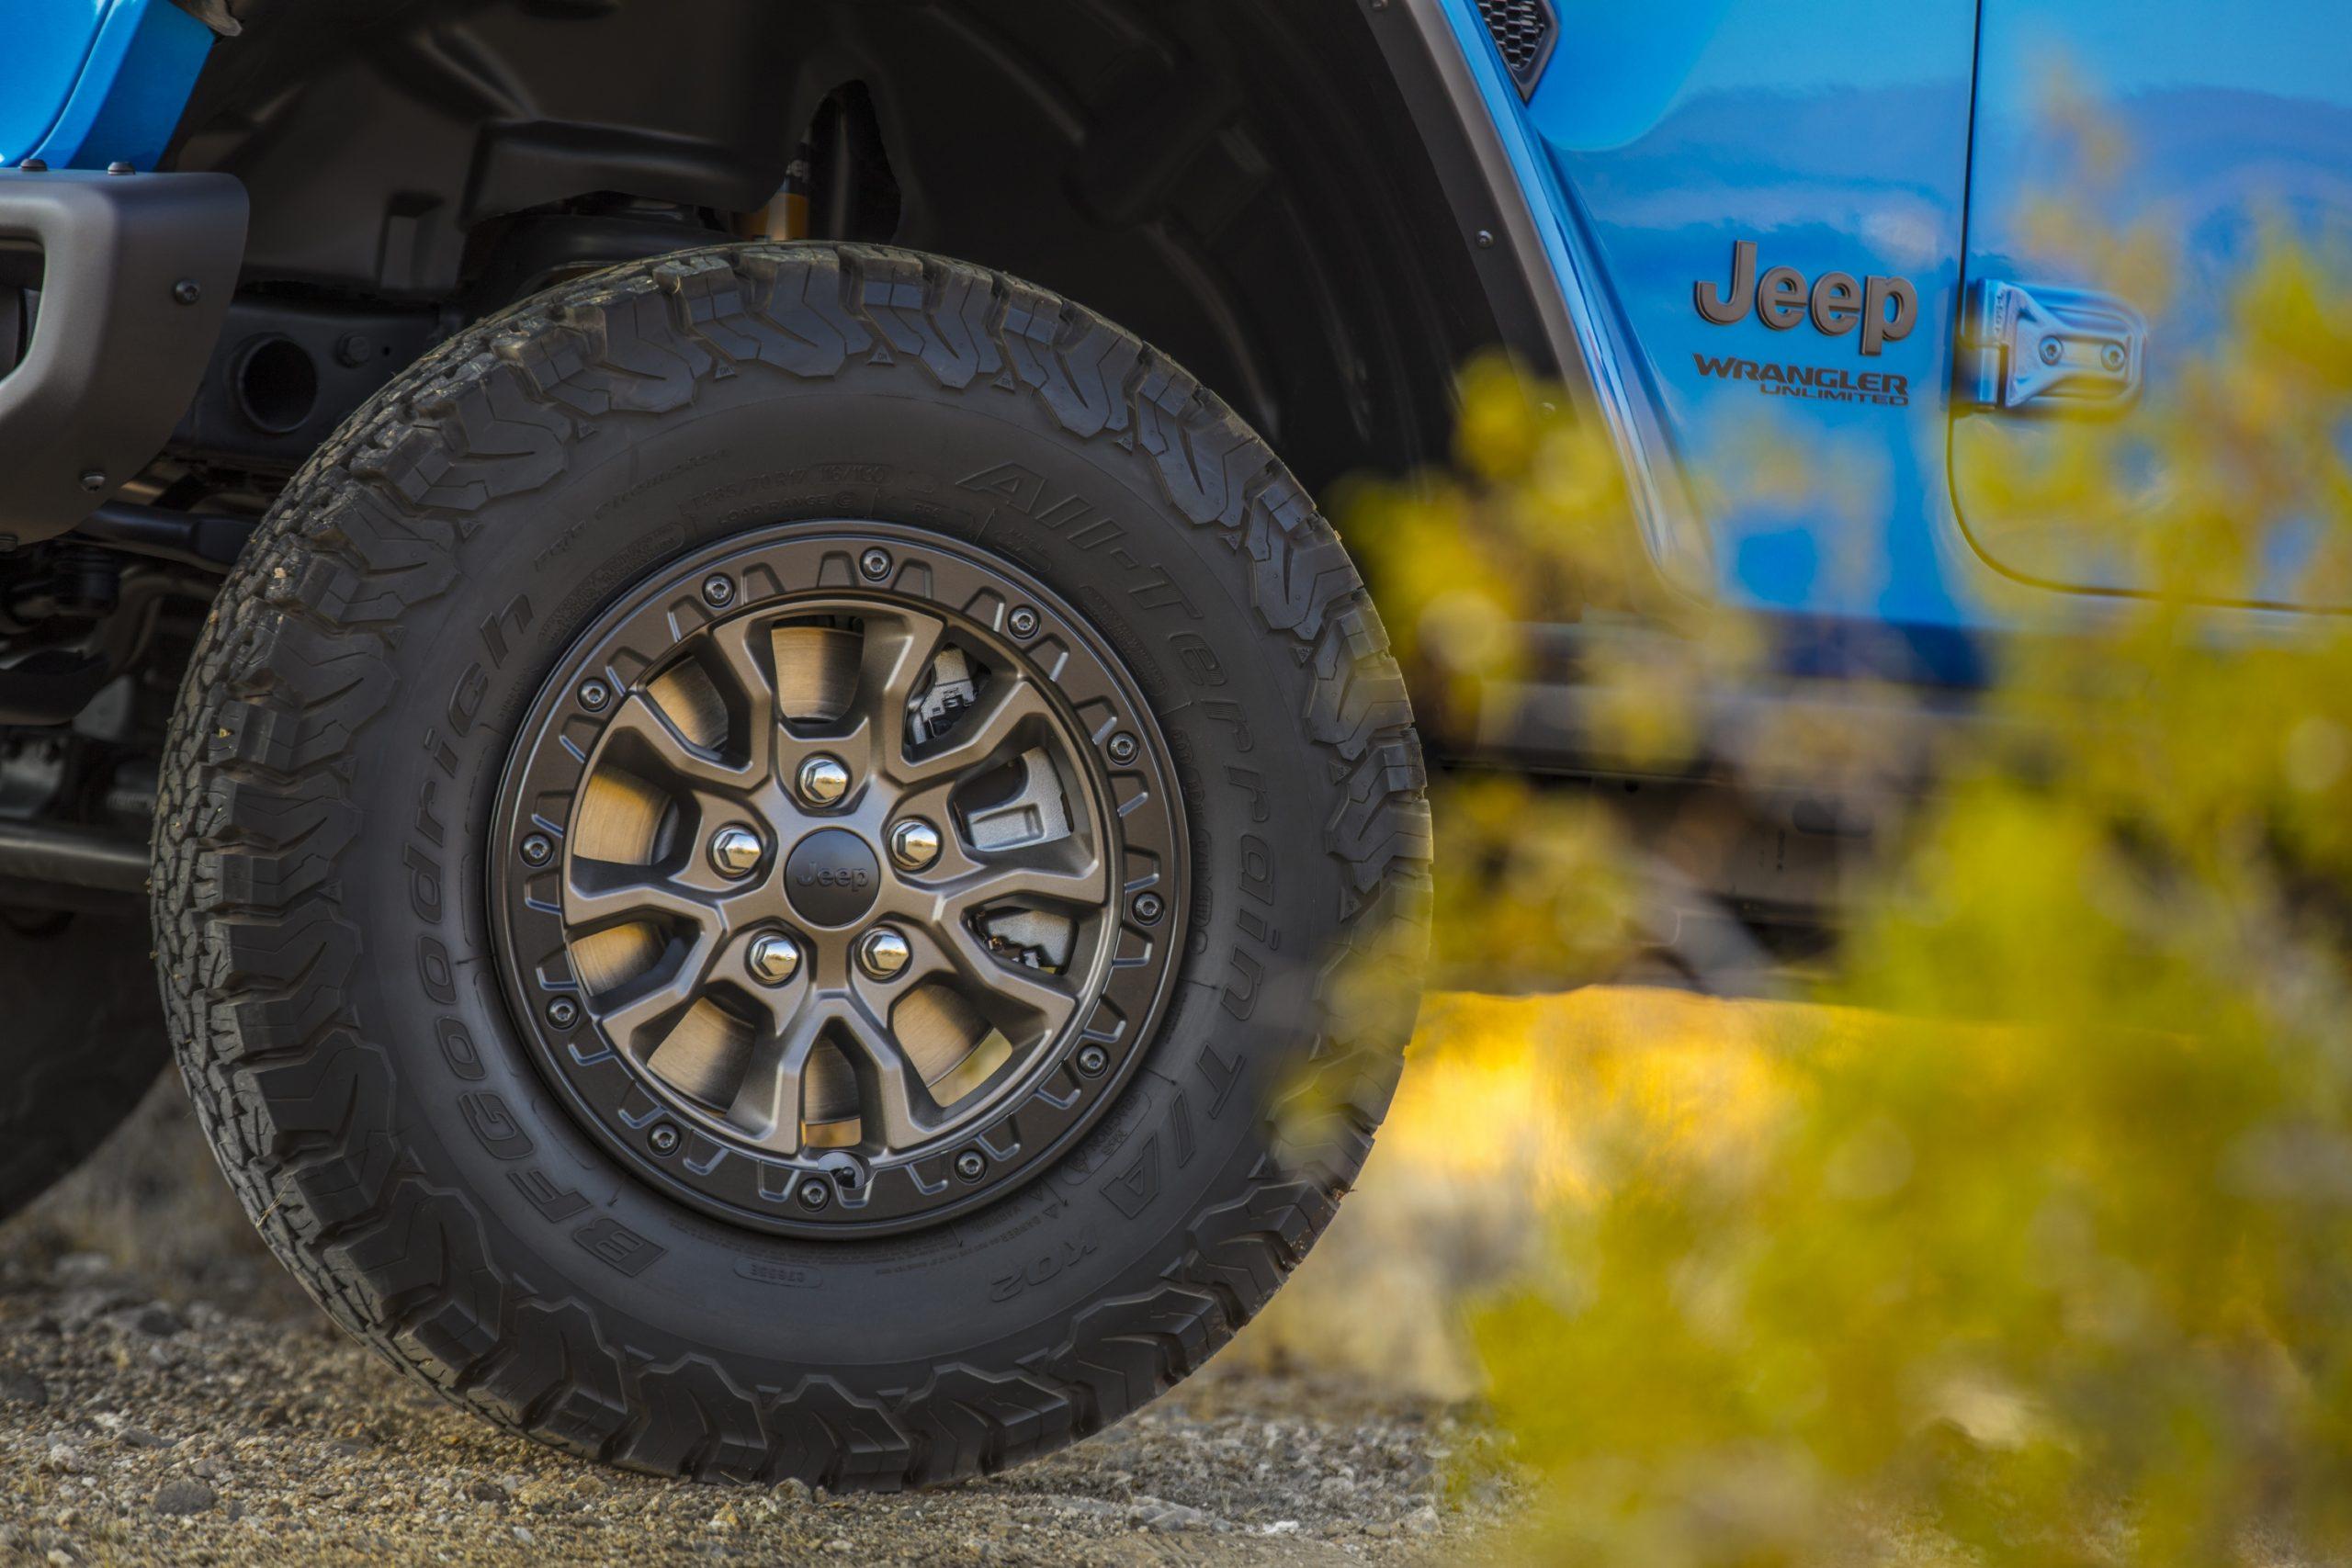 2021 Jeep Wrangler Rubicon 392 whee and tire